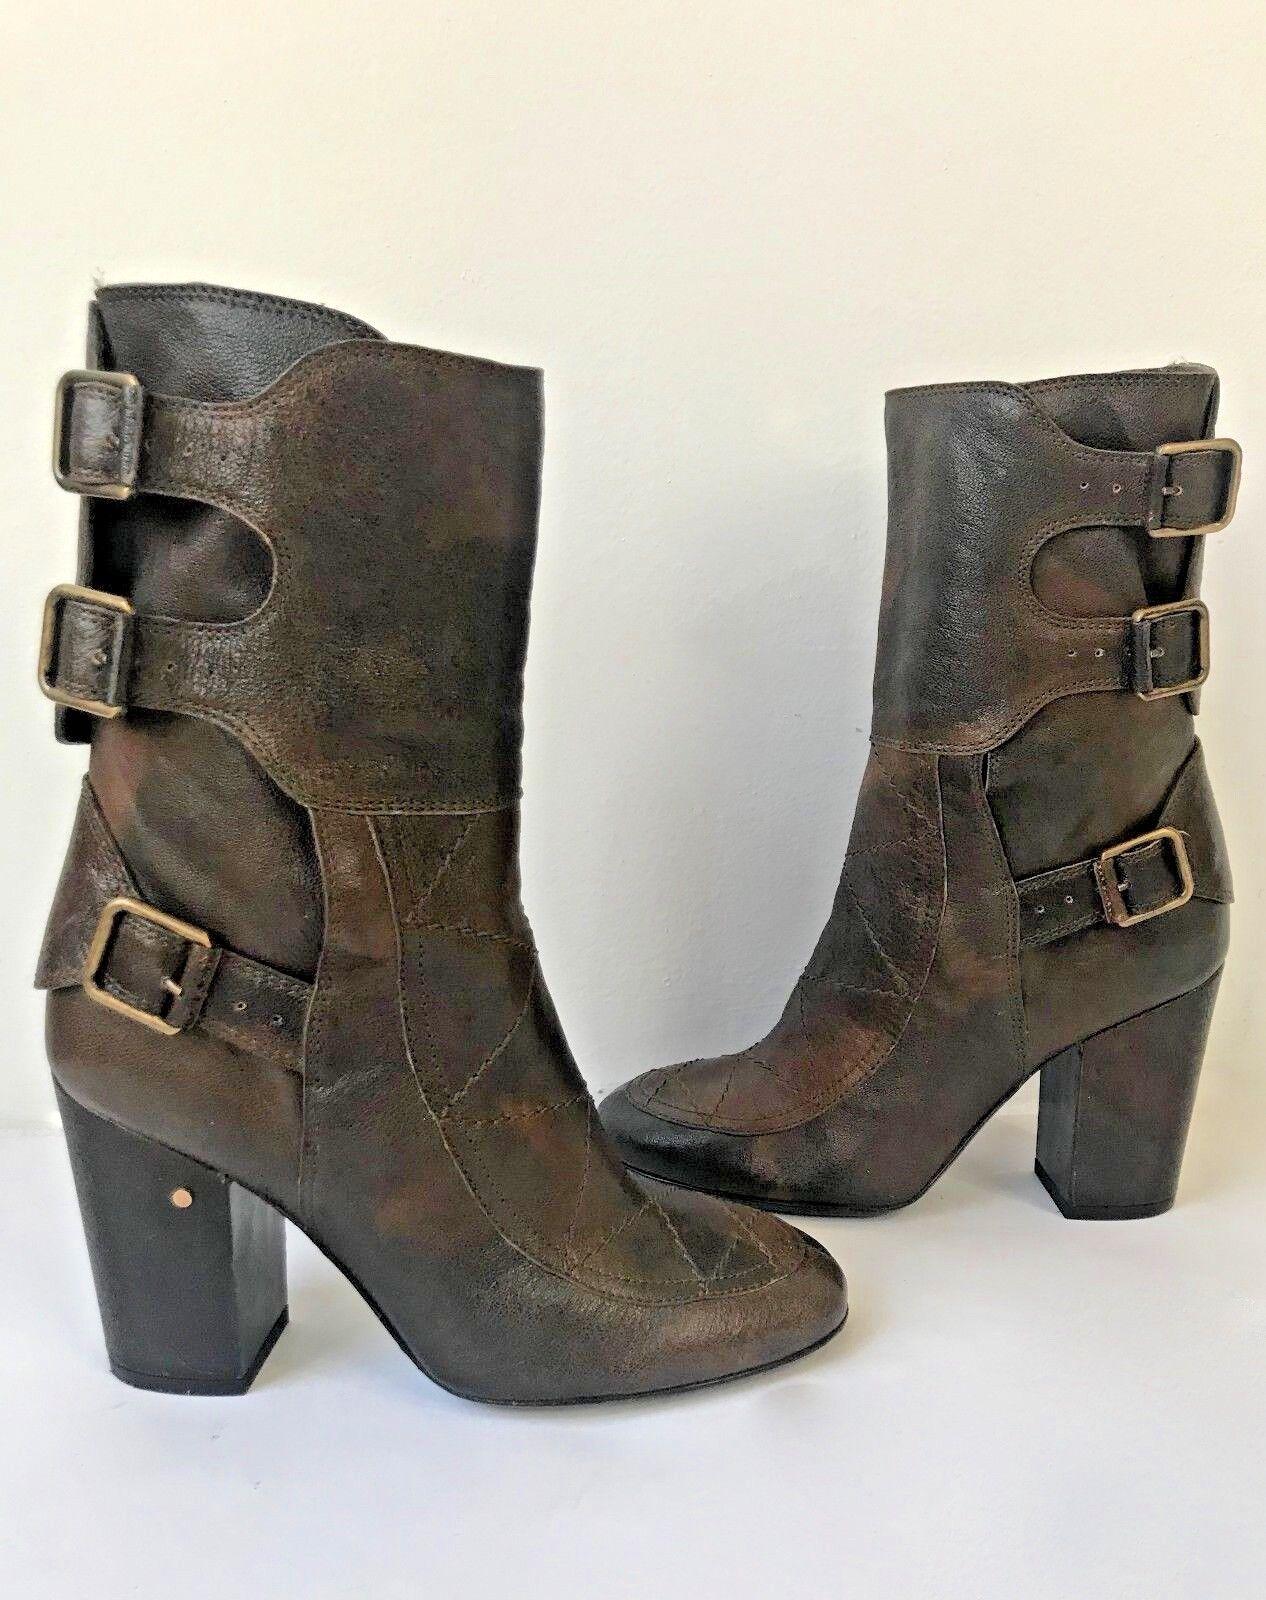 Laurence Dacade brown leather high heel distress boots booties buckle Sz37 7